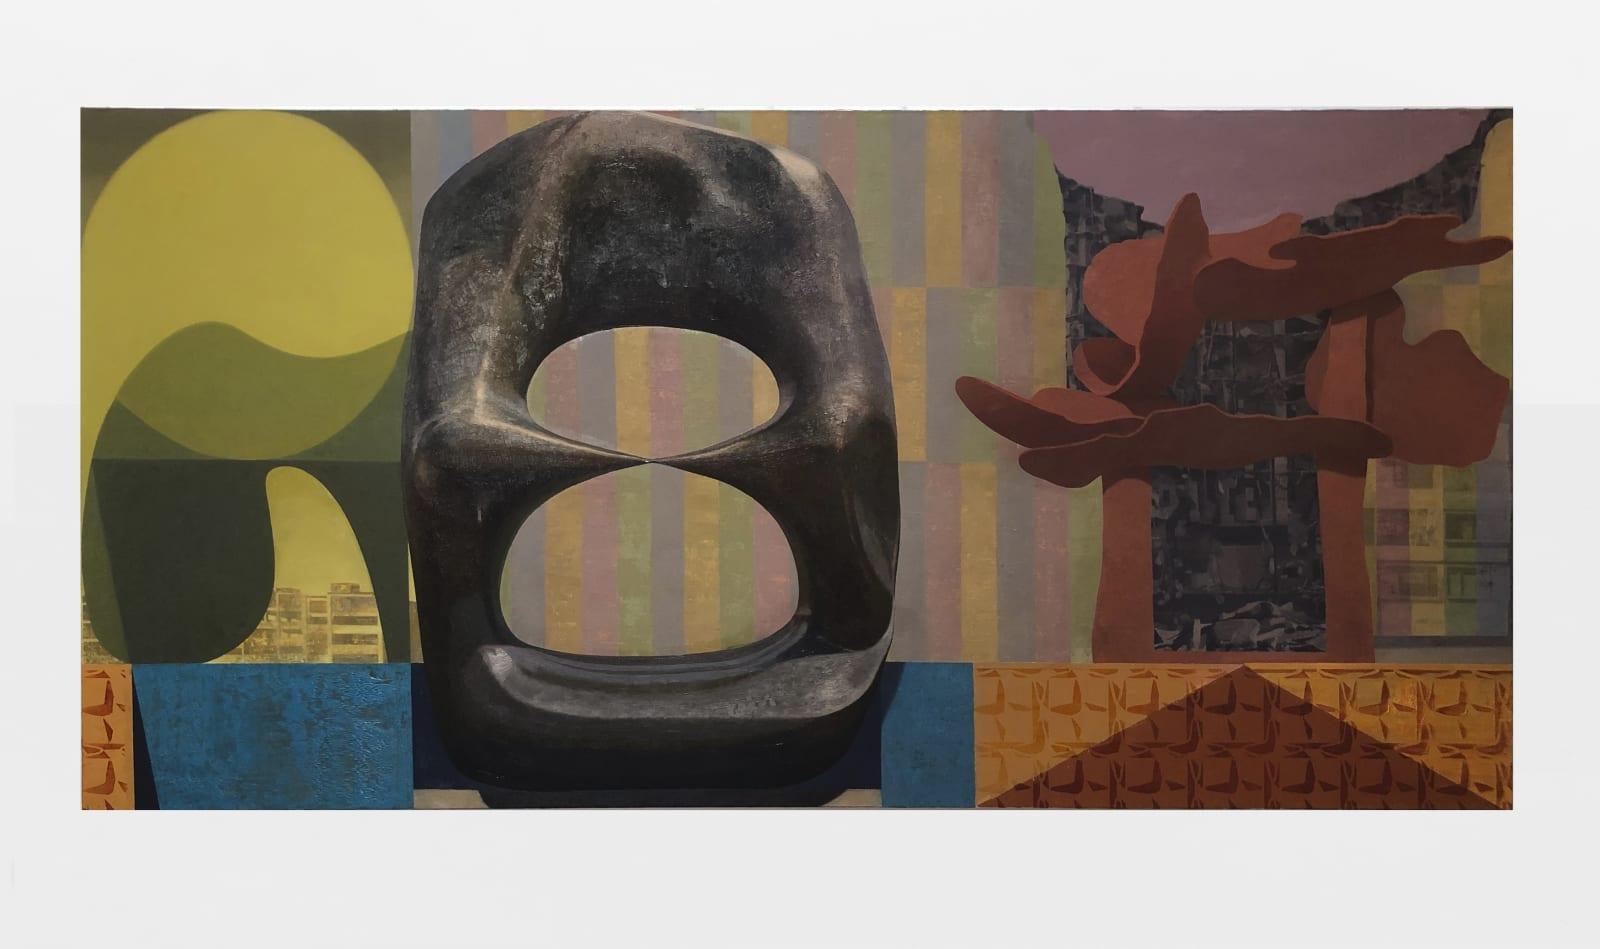 Daniel Dove Sculpture Park, 2020 Oil on canvas 44 x 96 in 111.8 x 243.8 cm